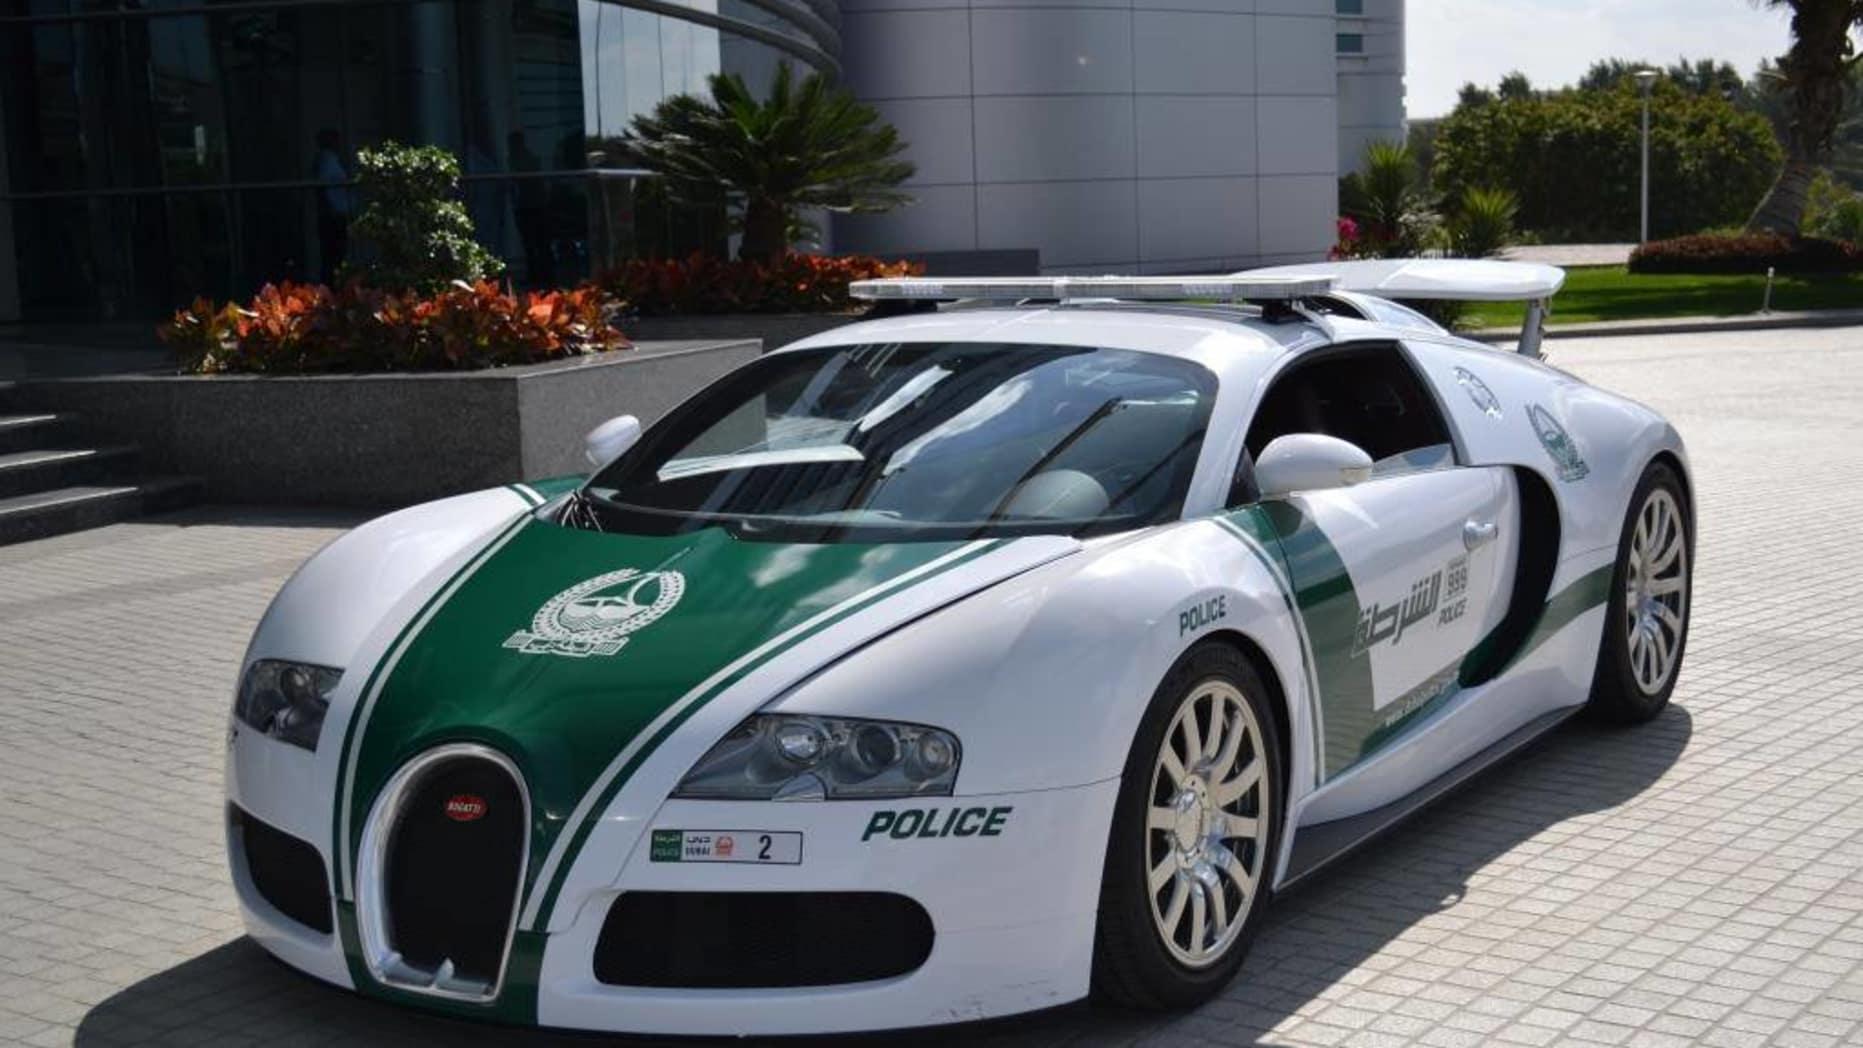 http-//cdn.cnn.com/cnnnext/dam/assets/170321162454-dubai-police-bugatti.jpg